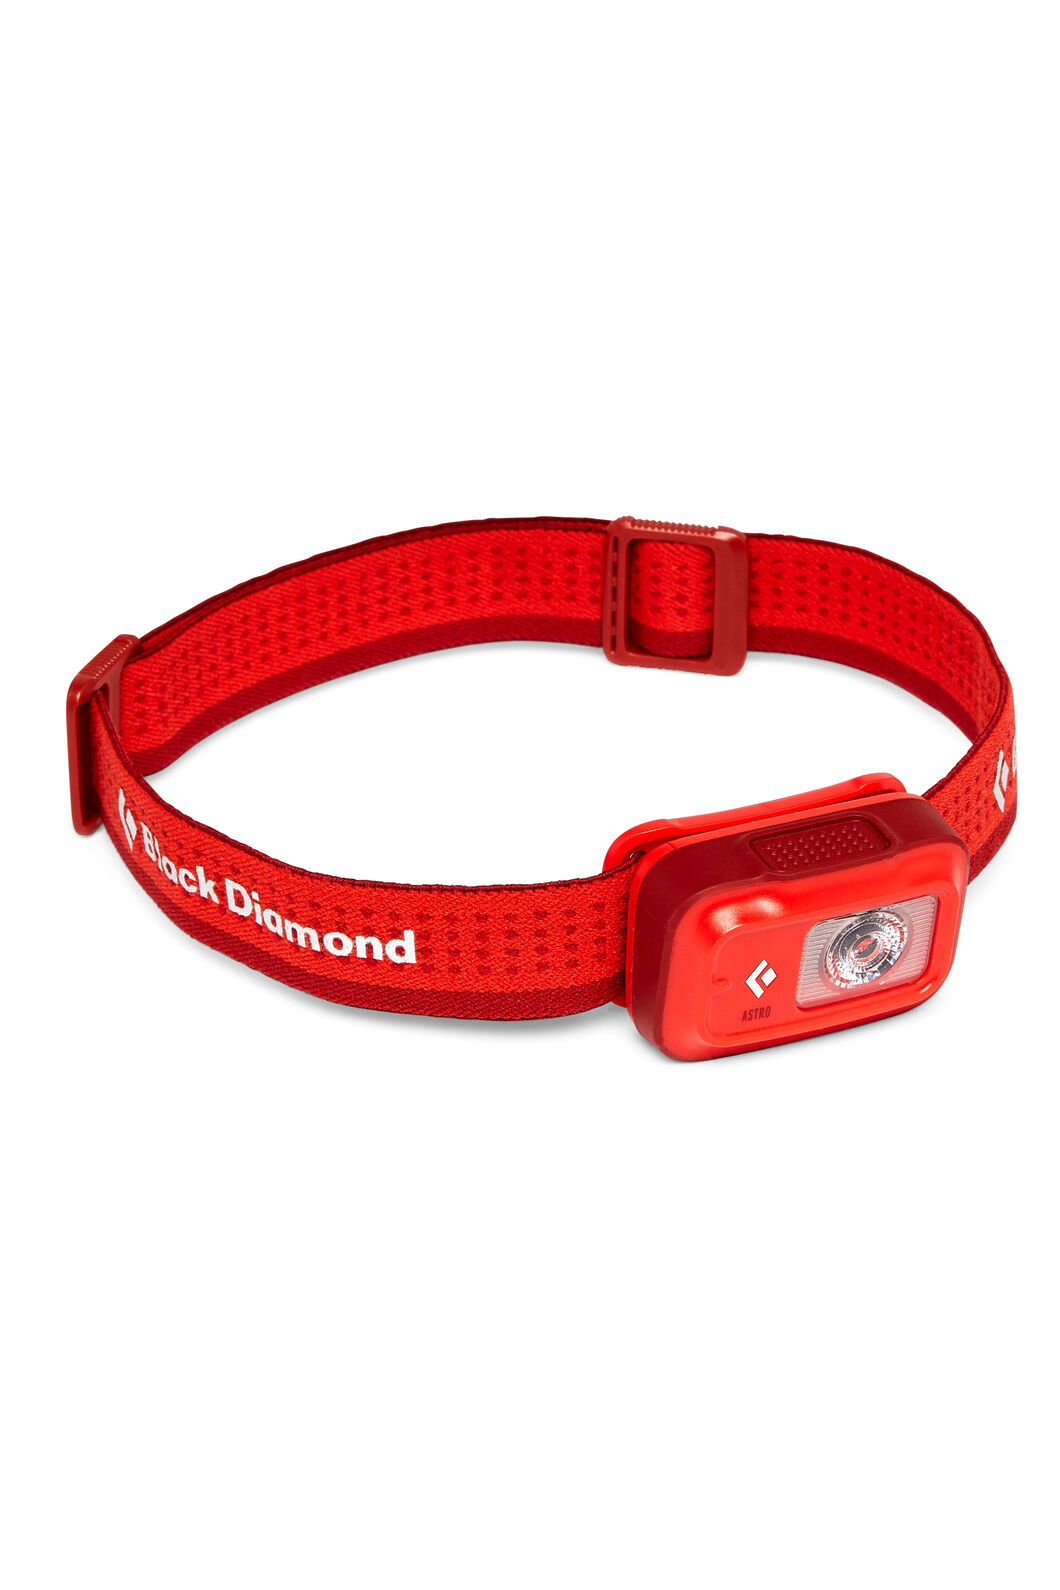 Black Diamond Astro 250 Headlamp, OCTANE, hi-res